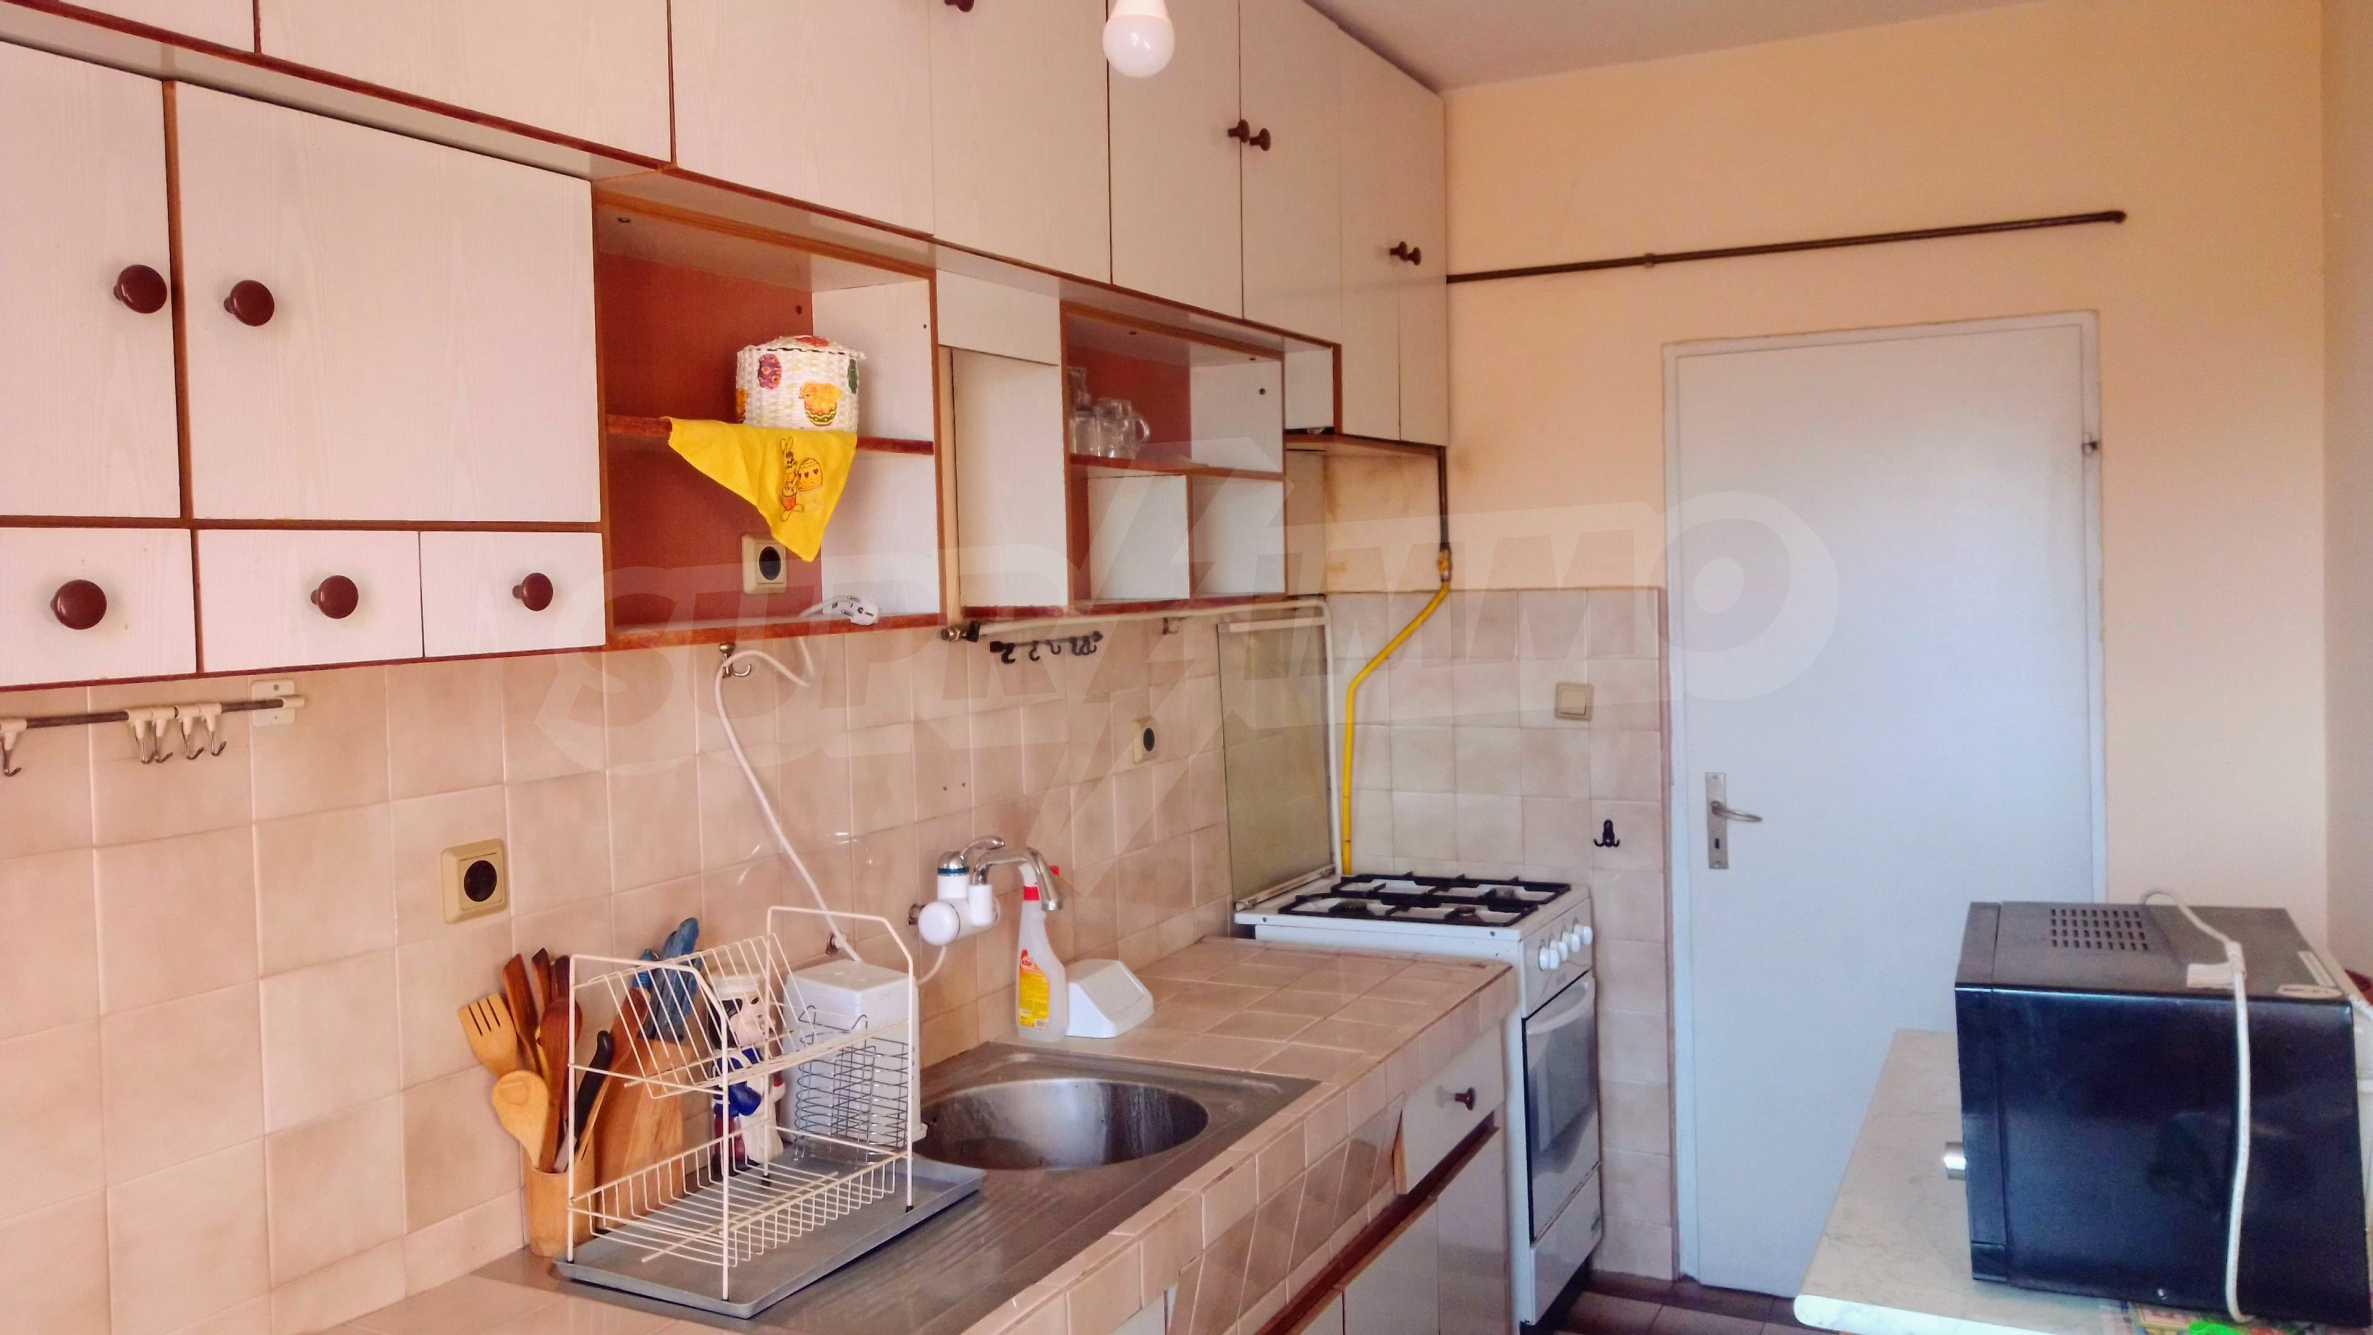 Слънчев тристаен апартамент в град Севлиево  8